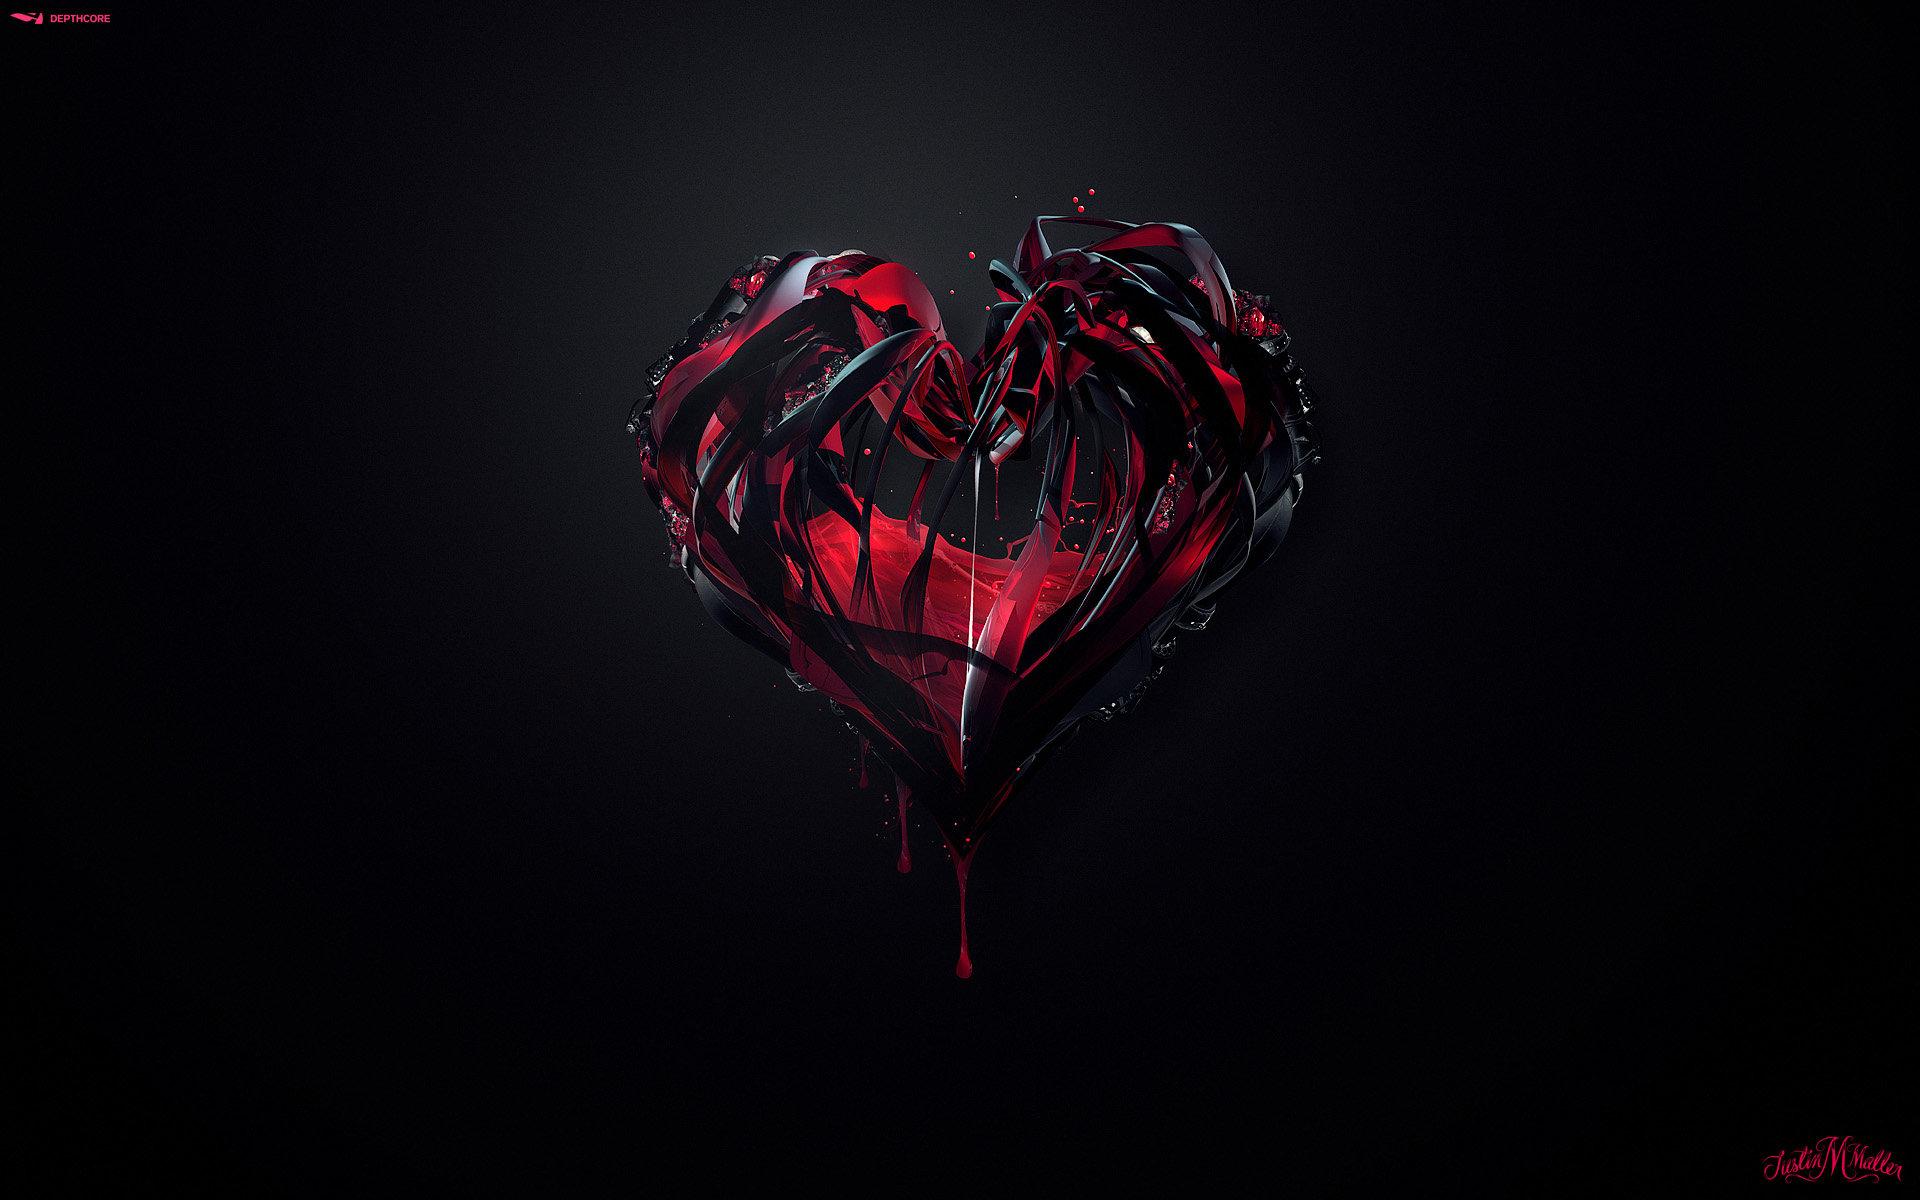 HeartCore502298904 - HeartCore - Kitty, HeartCore